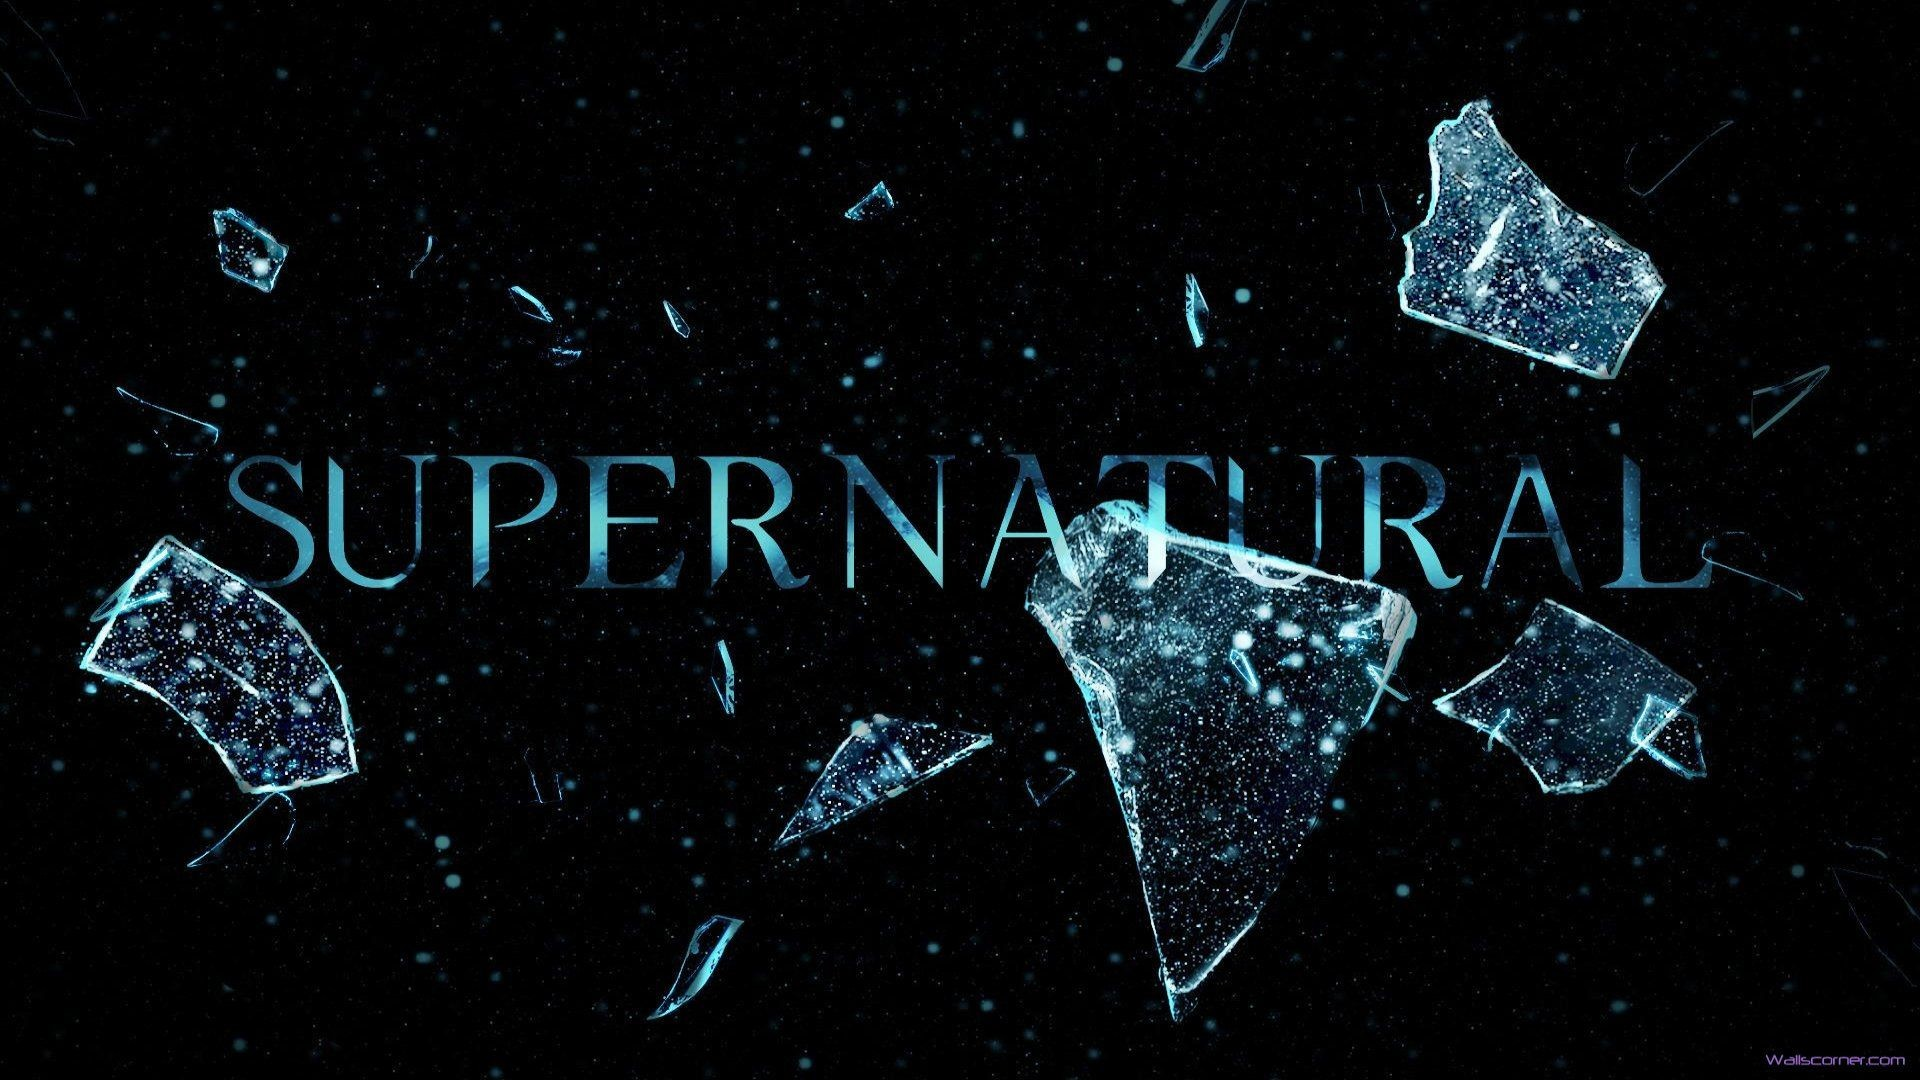 Supernatural Wallpaper and Background Supernatural TV Series Supernatural  Wallpaper Wallpapers)